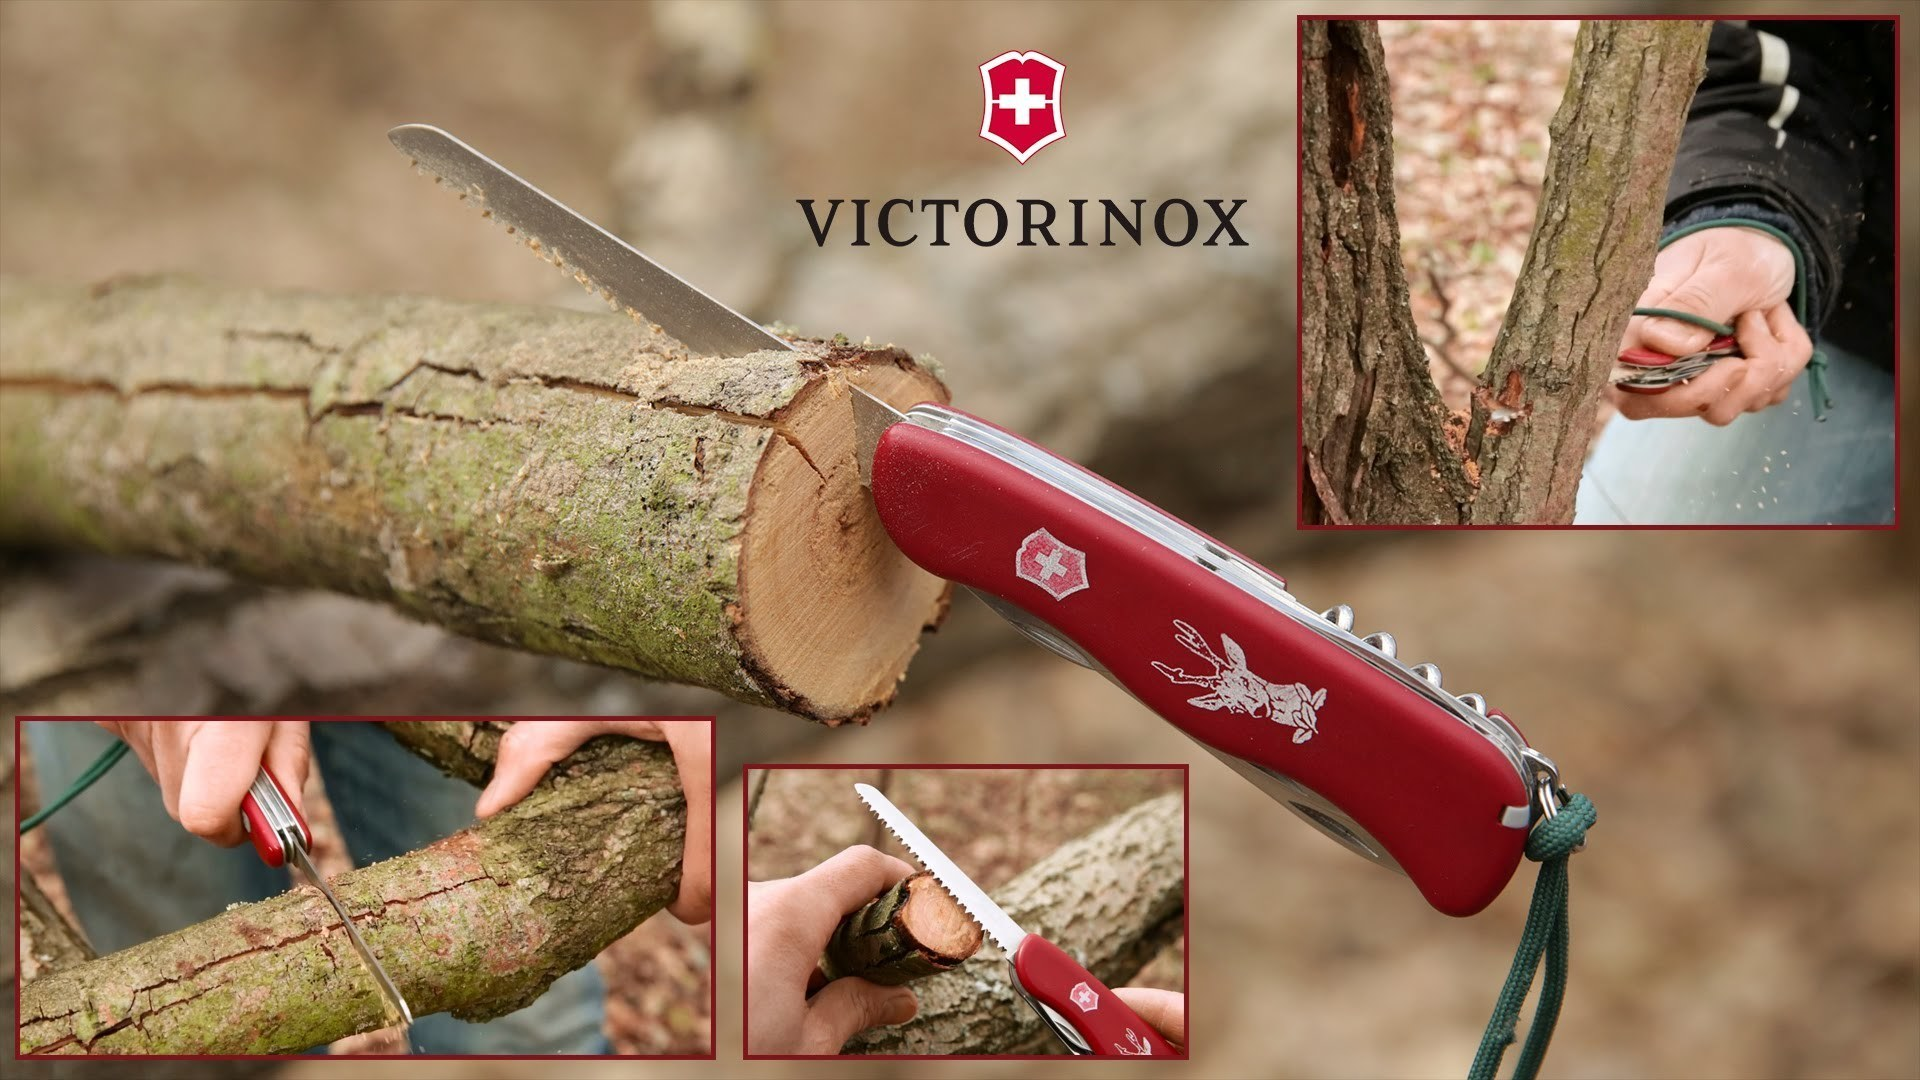 Складной швейцарский нож Victorinox Hunter 2017 (0.8573) 111 мм., 12 функций